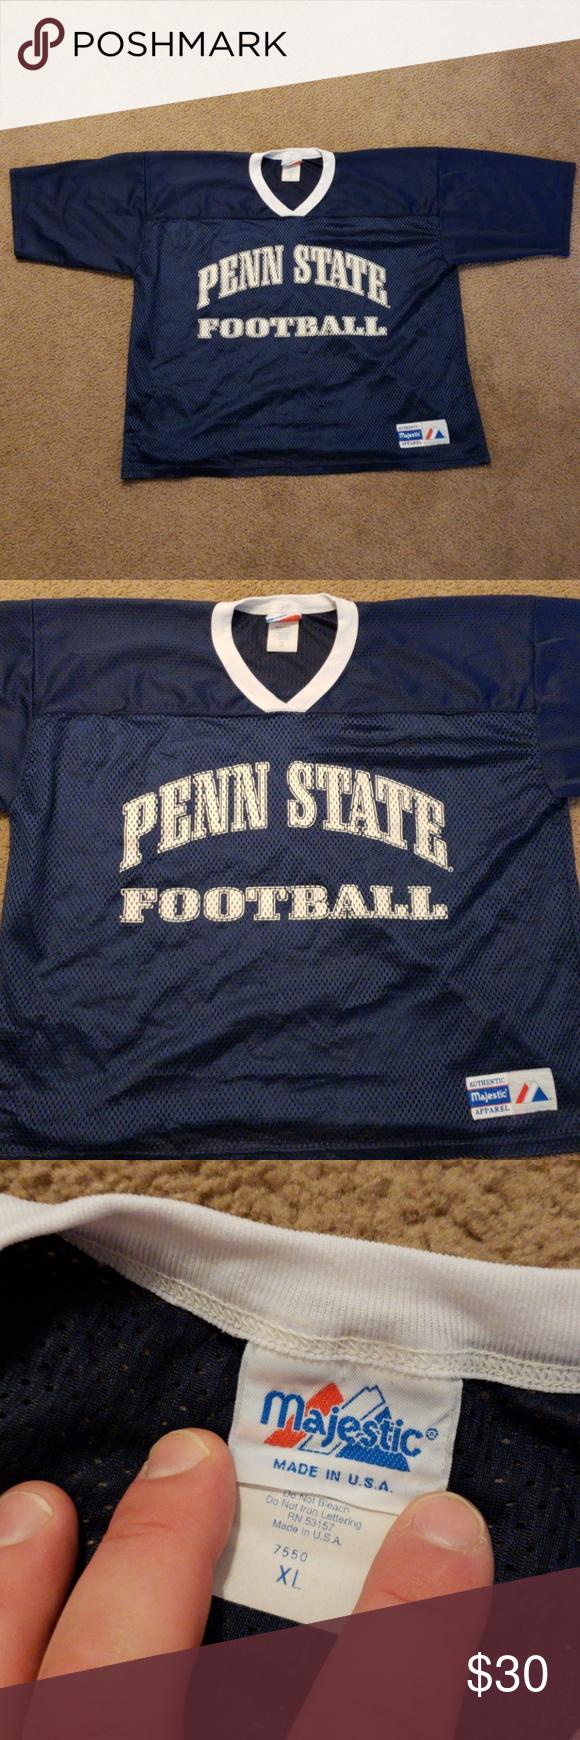 bb26f8f1bed VTG Penn State University PSU Football Jersey NCAA Vintage Majestic mens  Penn State University / PSU